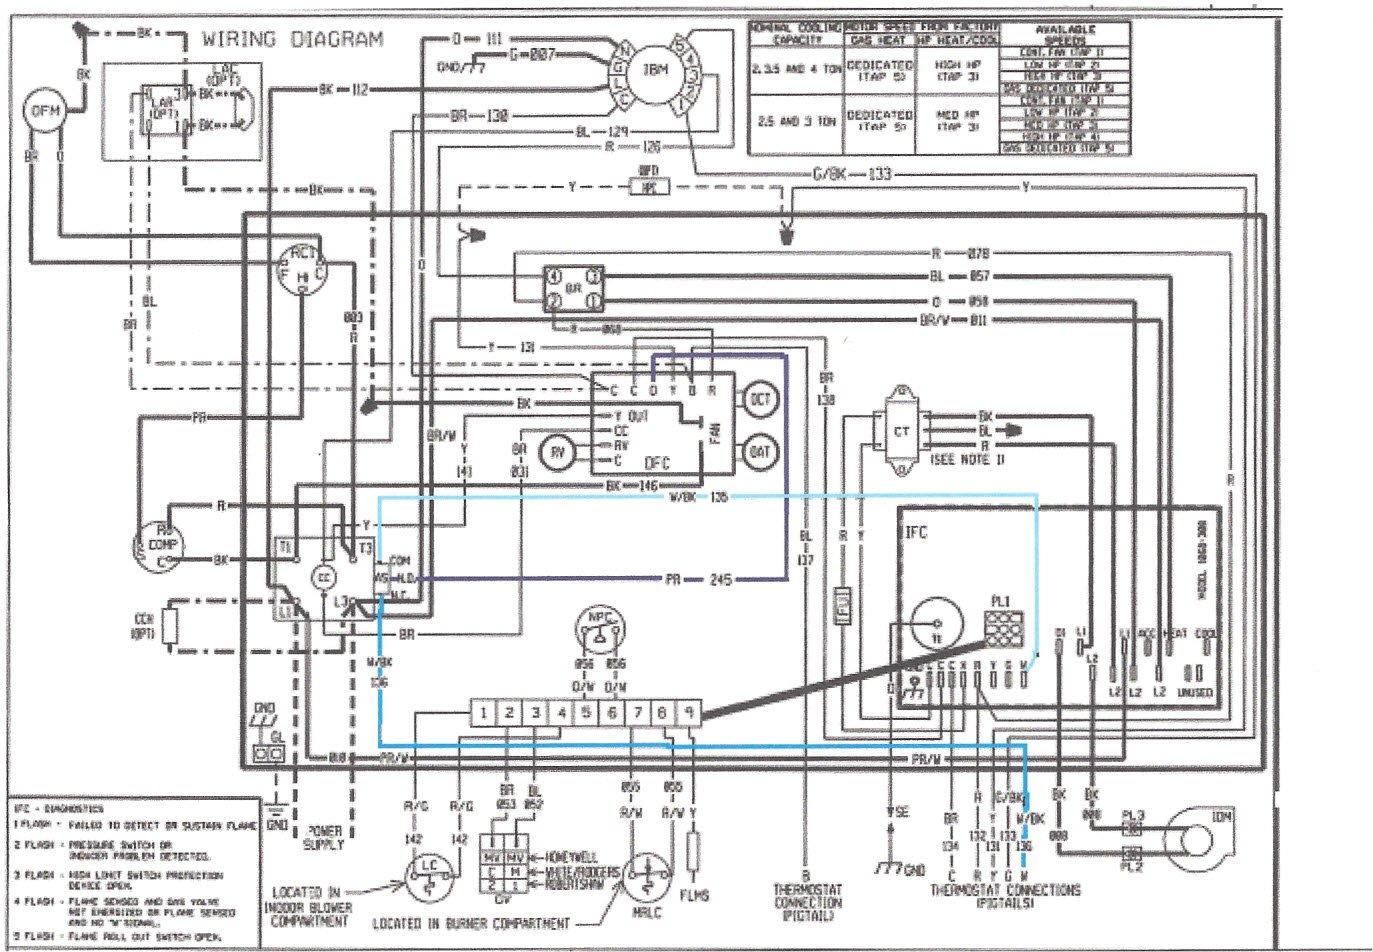 Heat Pump Wiring Diagram View - Wiring Diagrams Thumbs - Heat Pump Wiring Diagram Schematic